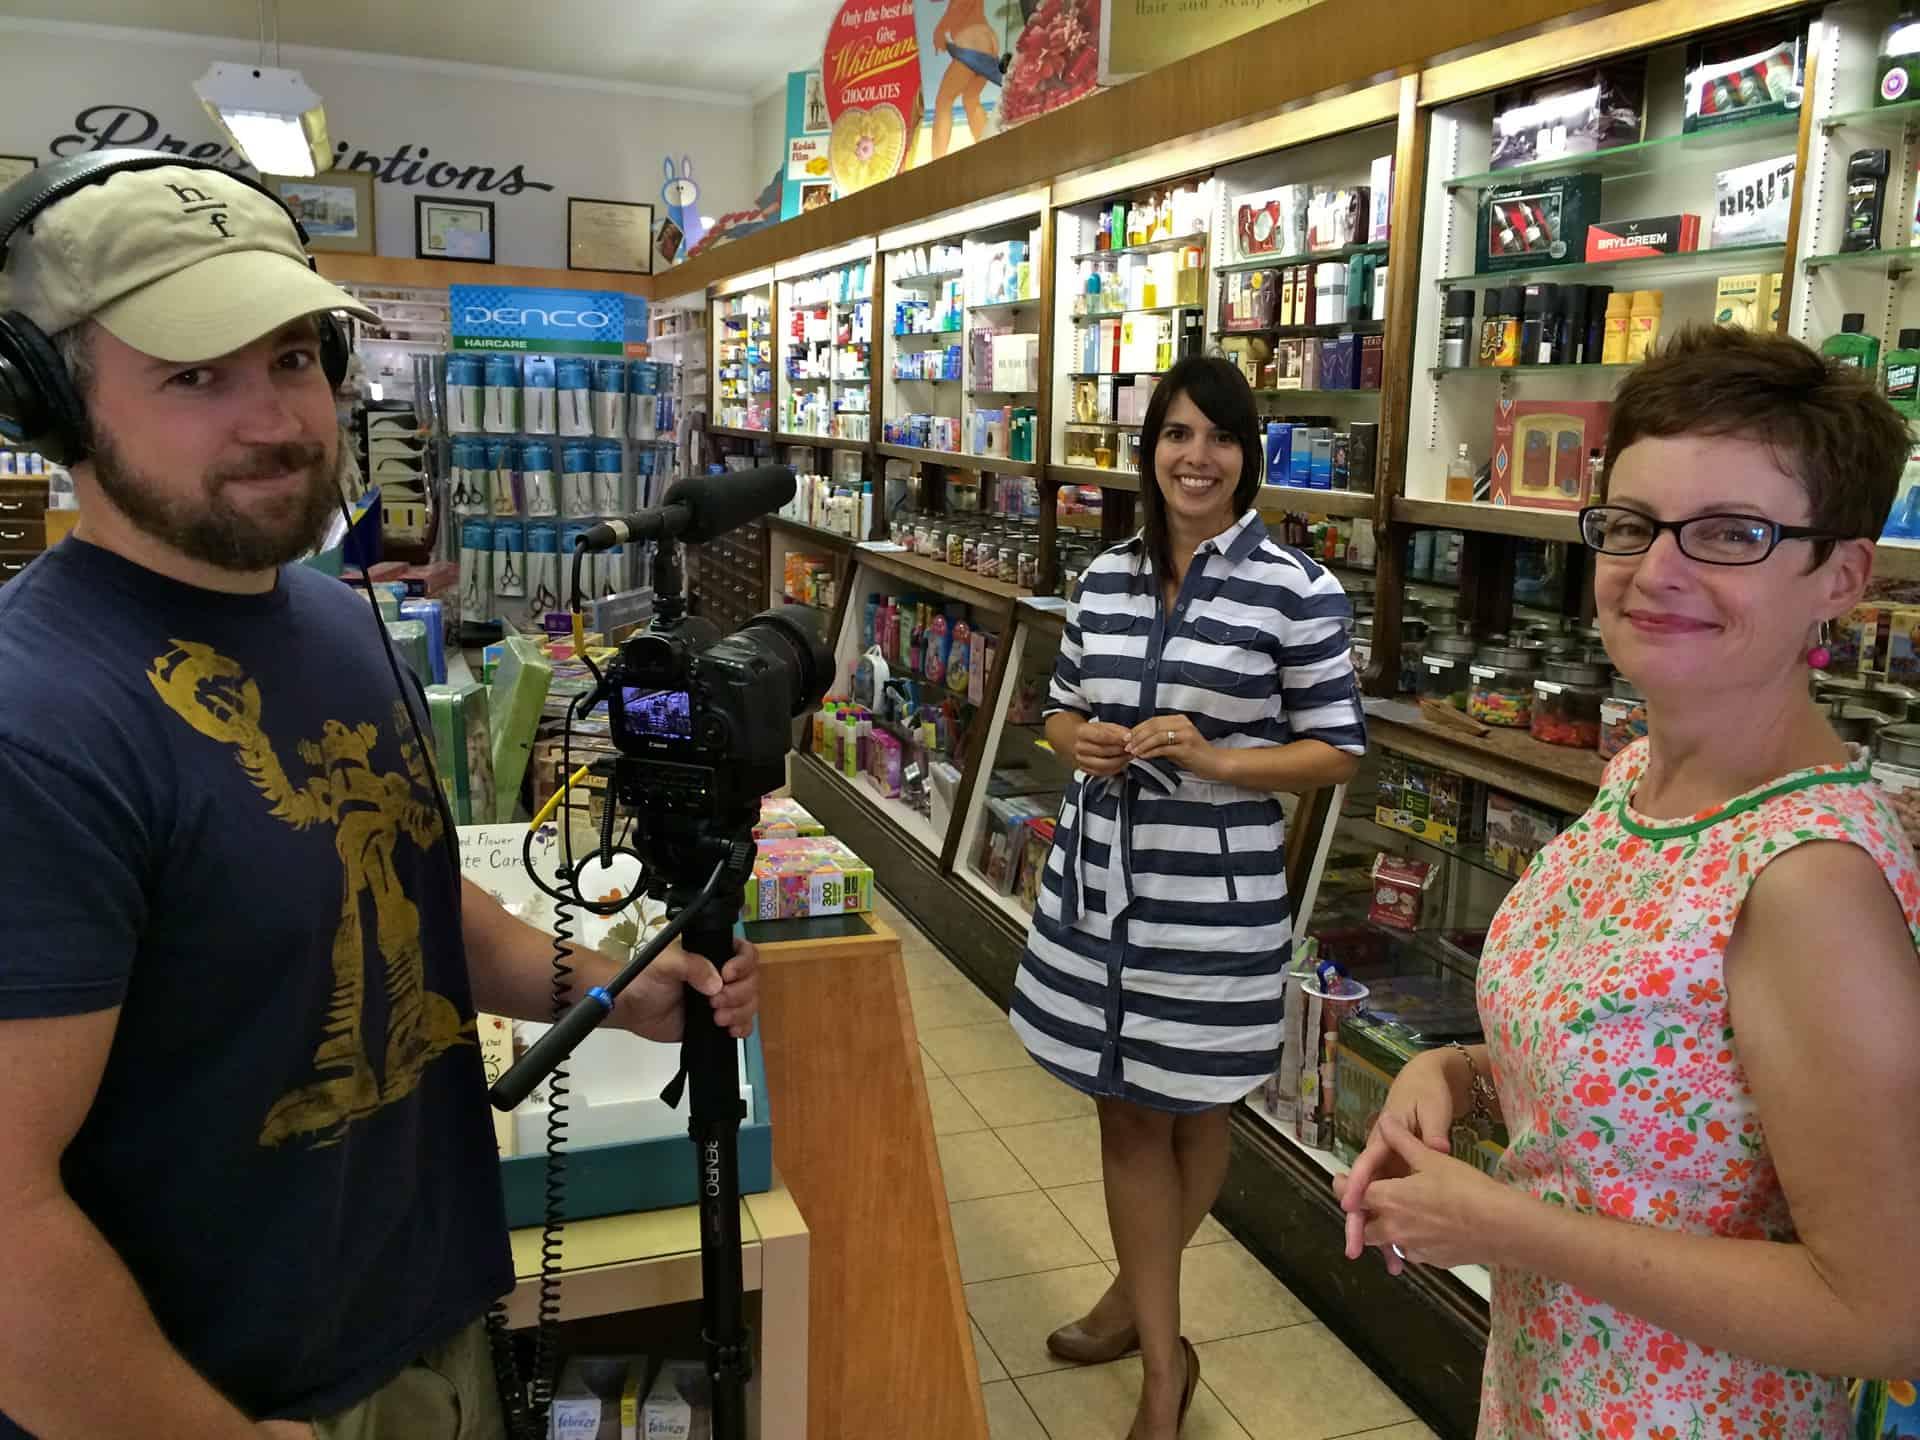 Adams & Bright Drug Store Retro Roadmap Video Shoot